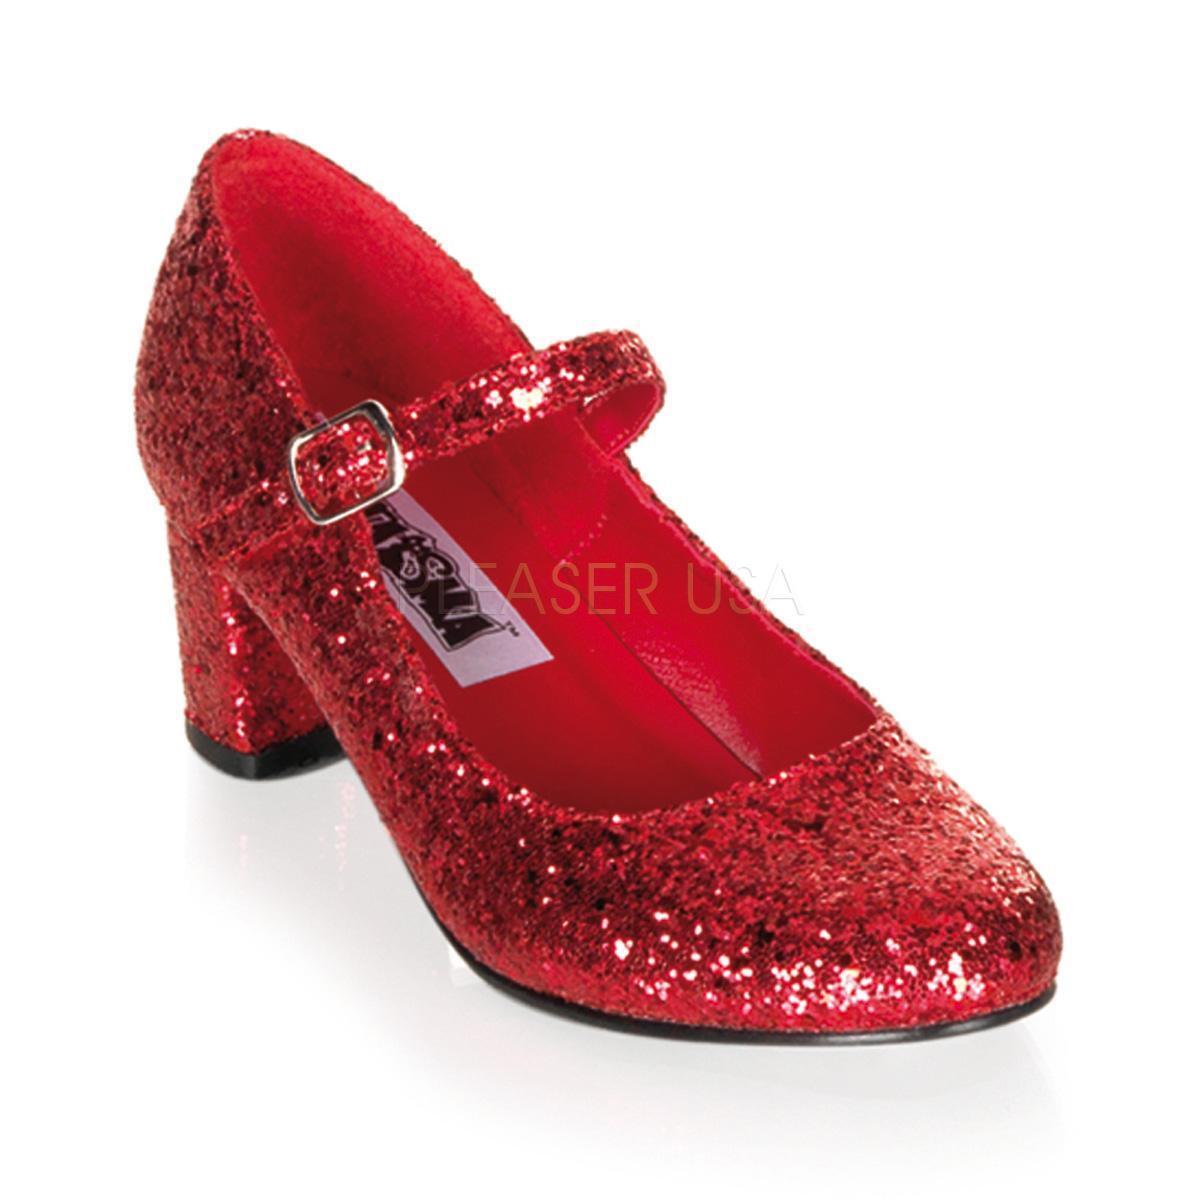 Funtasma Schoolgirl-50 ROT Glitter Heels - Costume,Fancy Dress,Schuhes,ROT,Gothic,